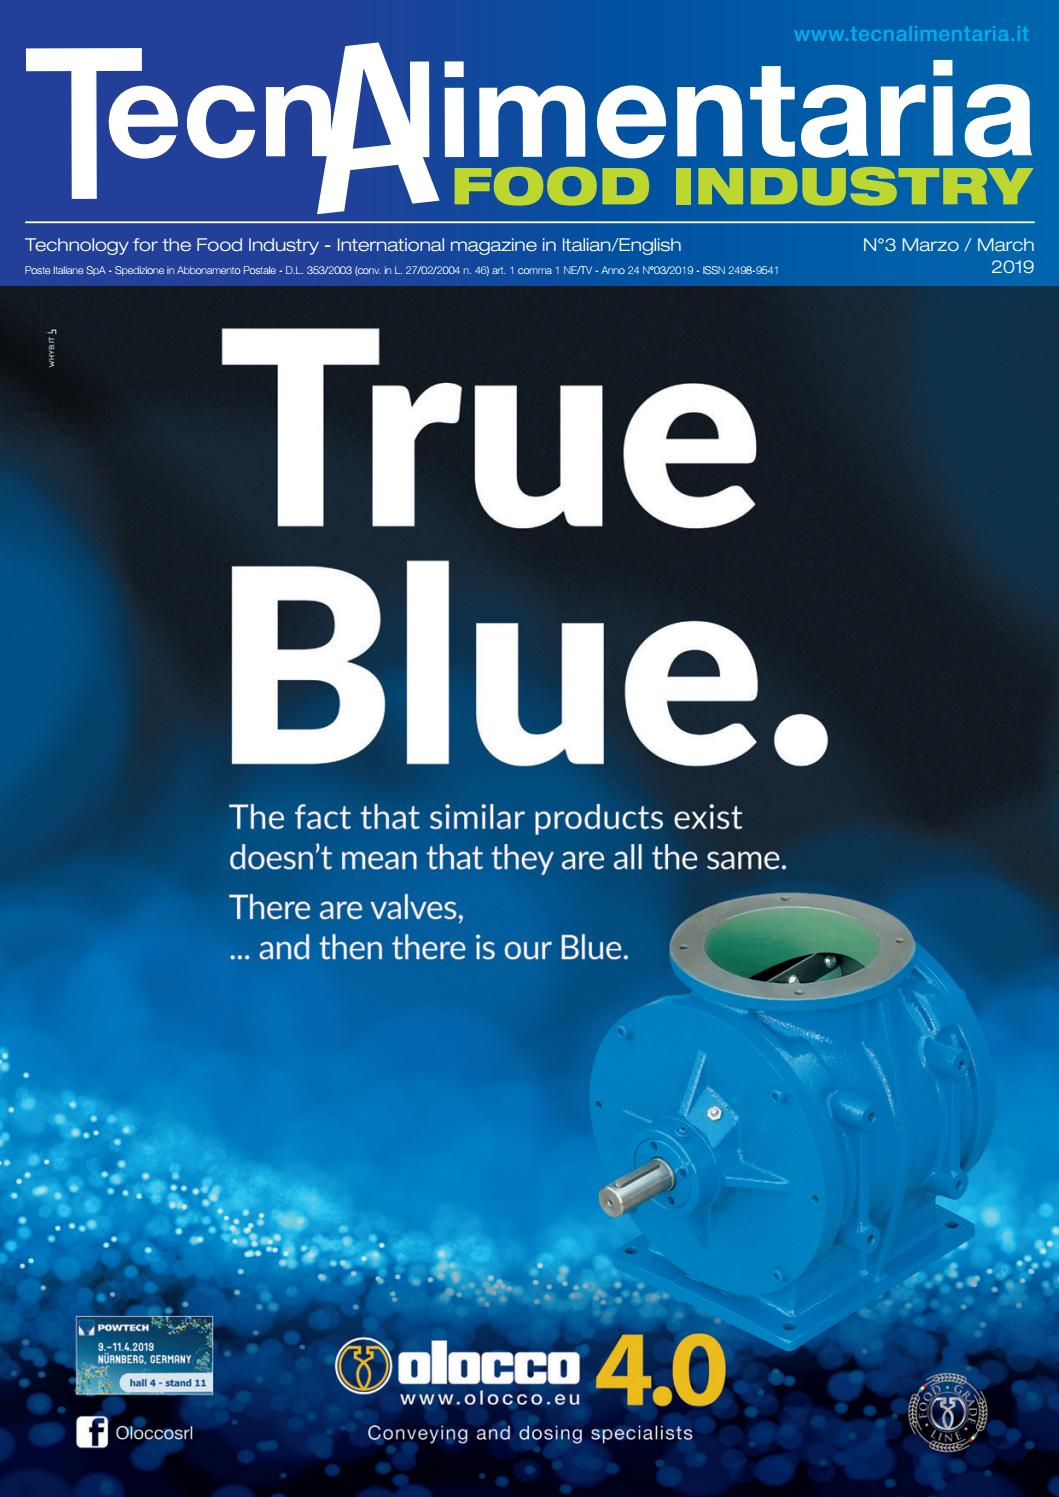 5d958a536c24 TecnAlimentaria Food Industry - Marzo Mach 2019 by TecnAlimentaria  Magazines - issuu